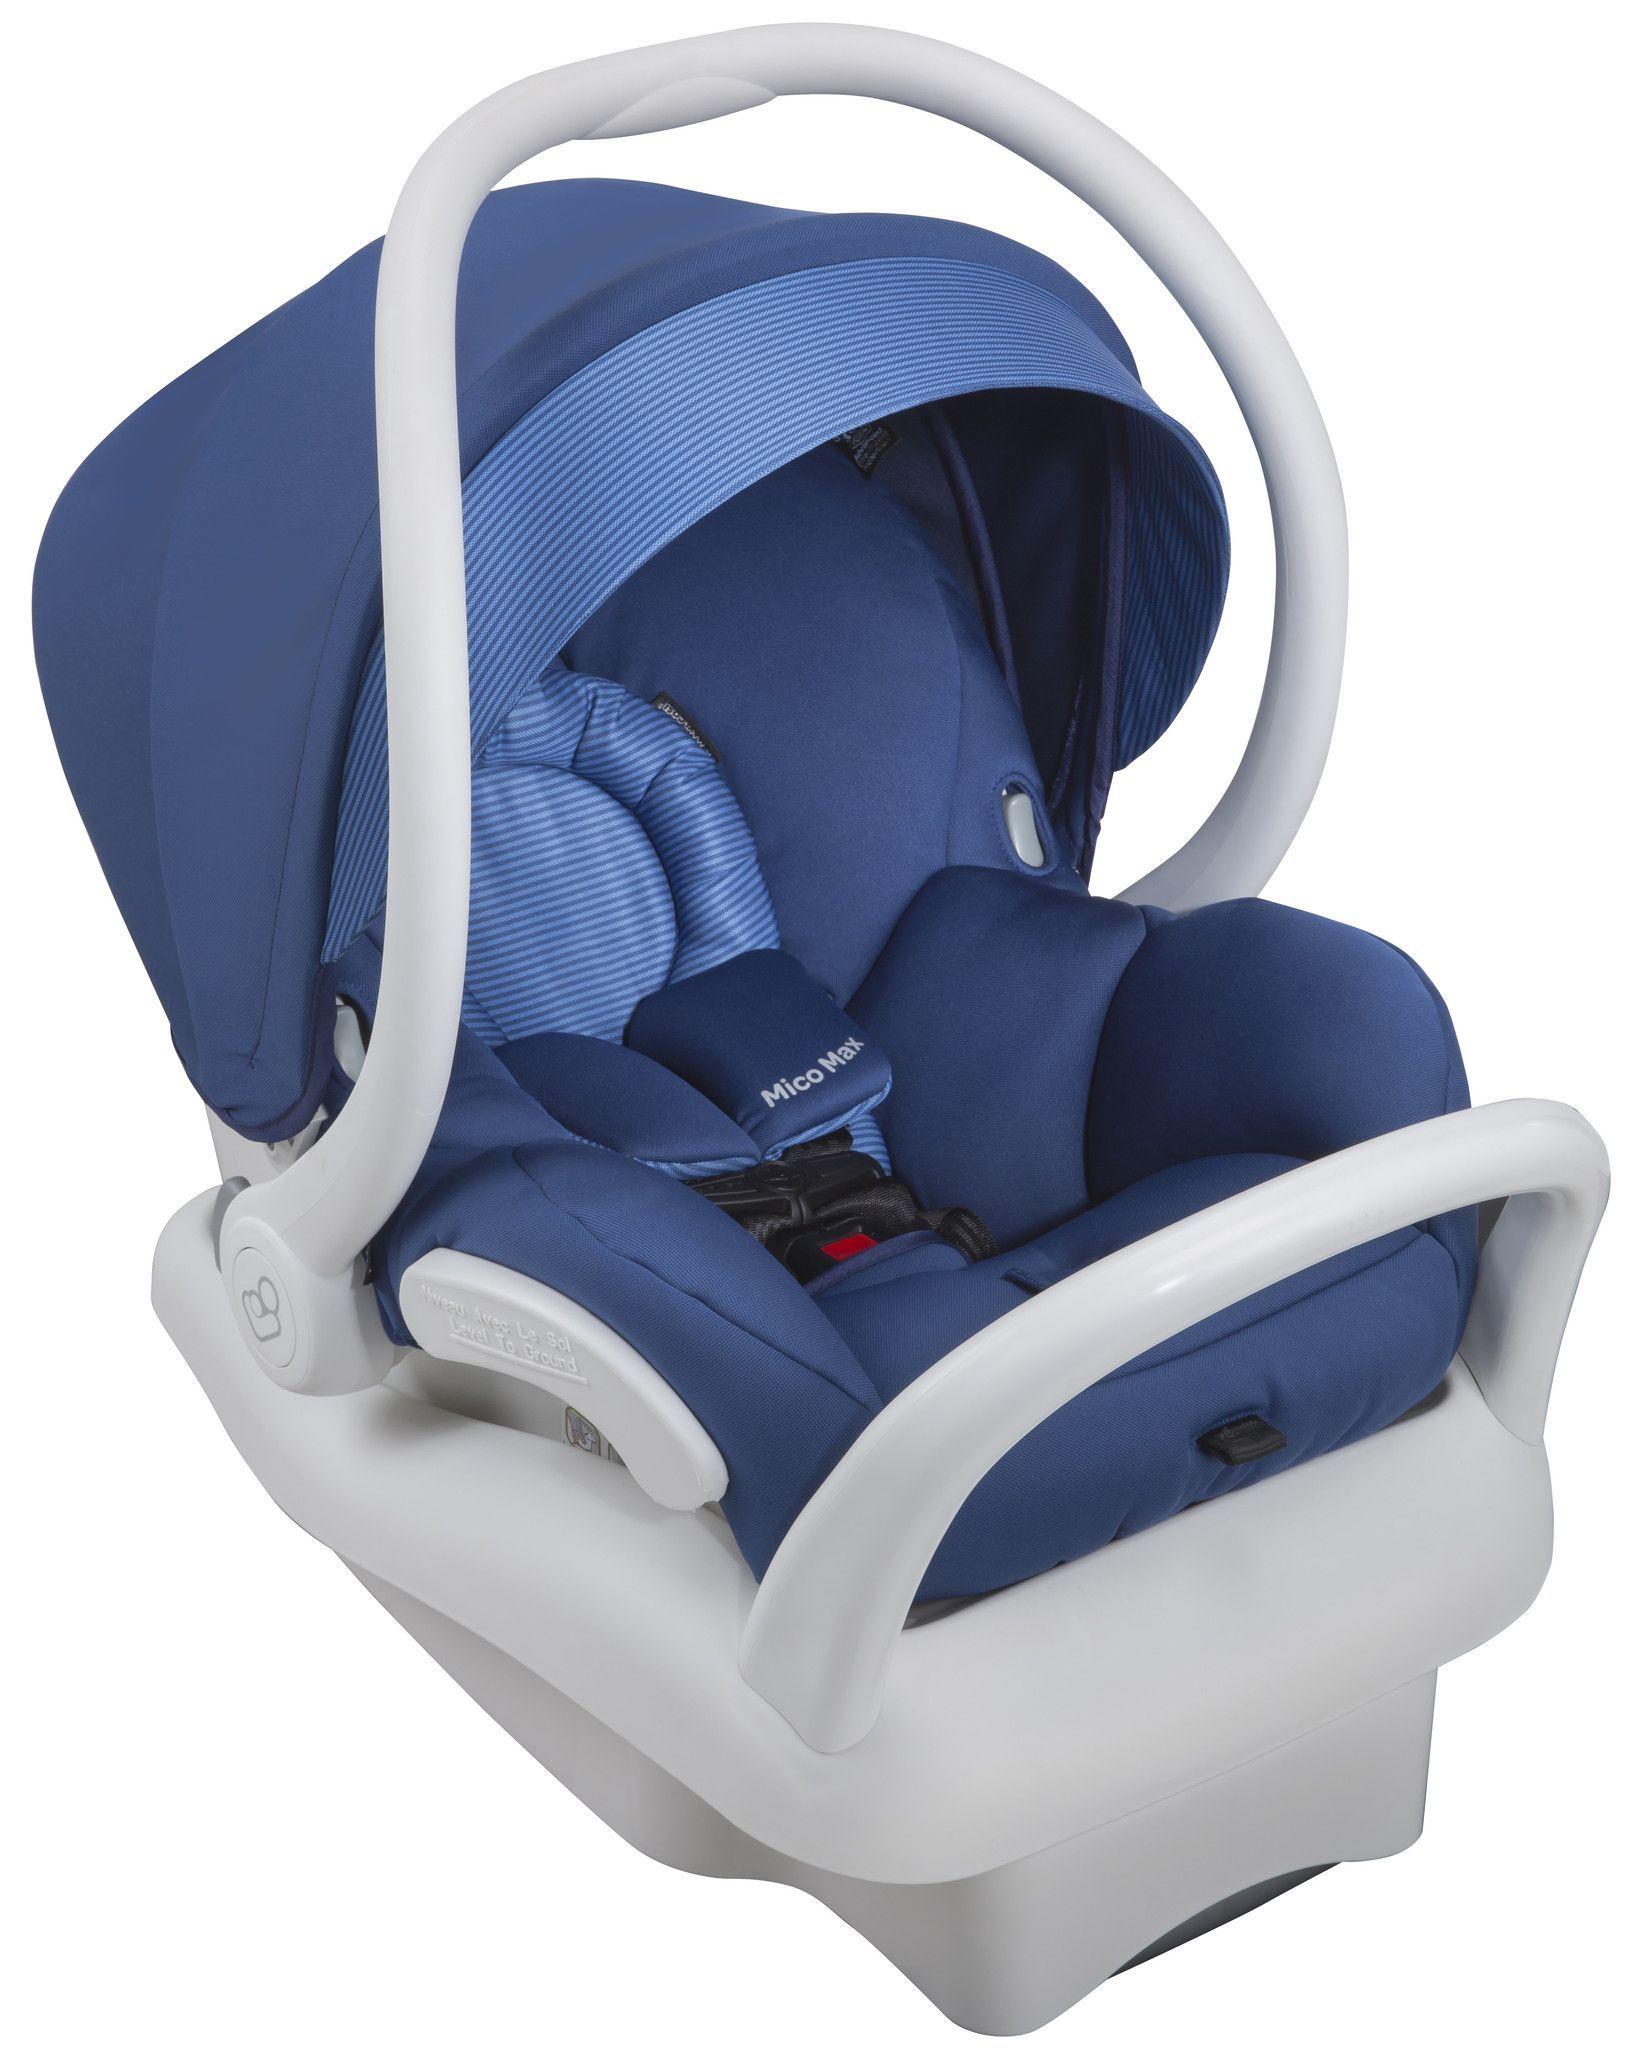 Maxi Cosi Mico Max 30 Infant Car Seat Devoted Black Black Base